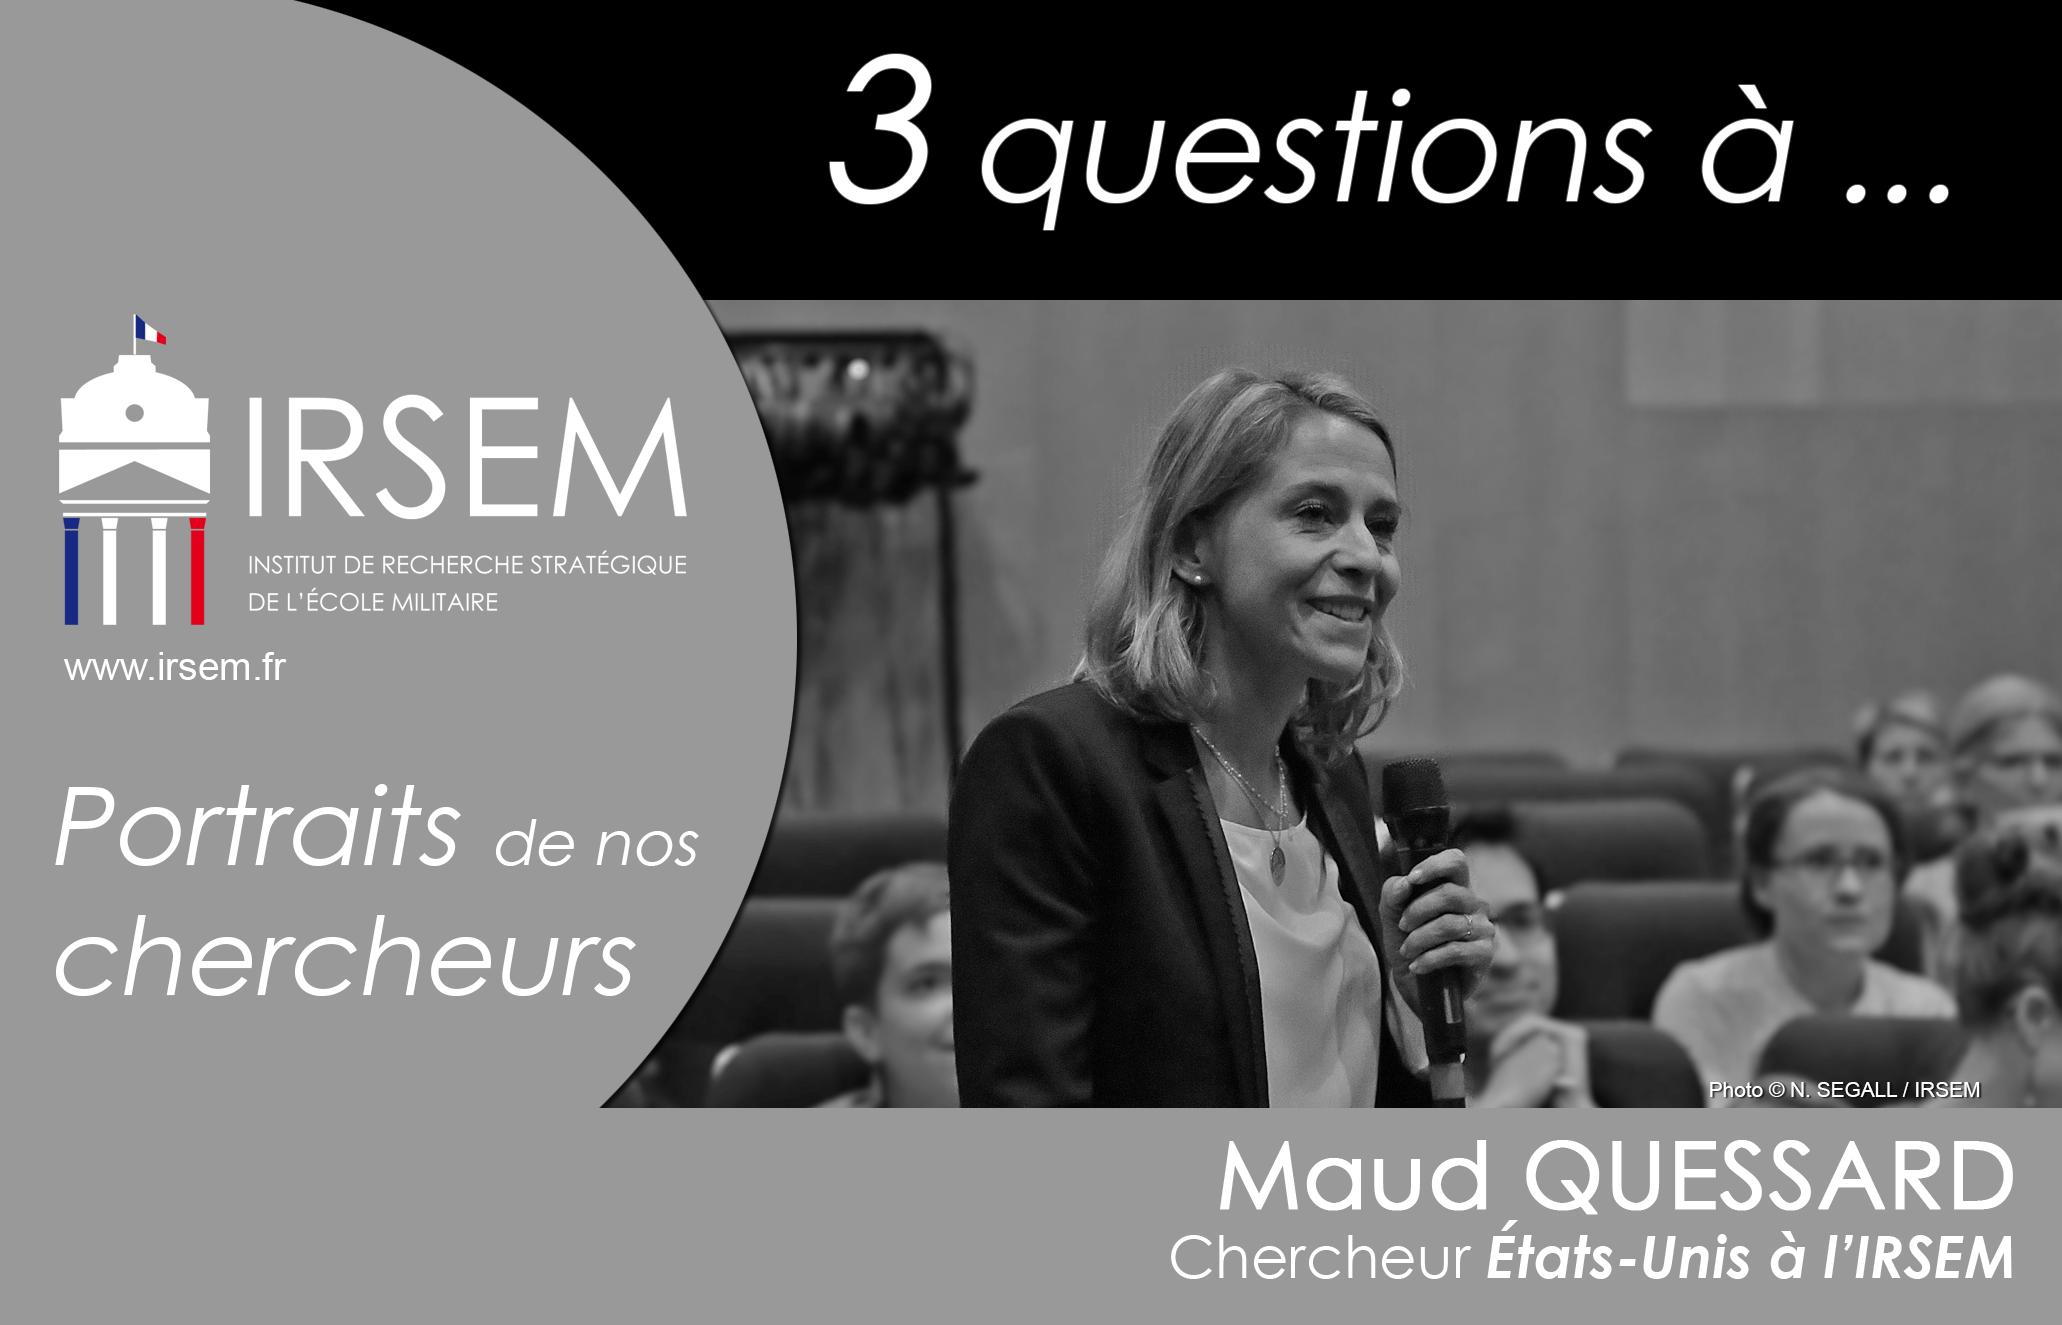 3 questions à ... Maud QUESSARD